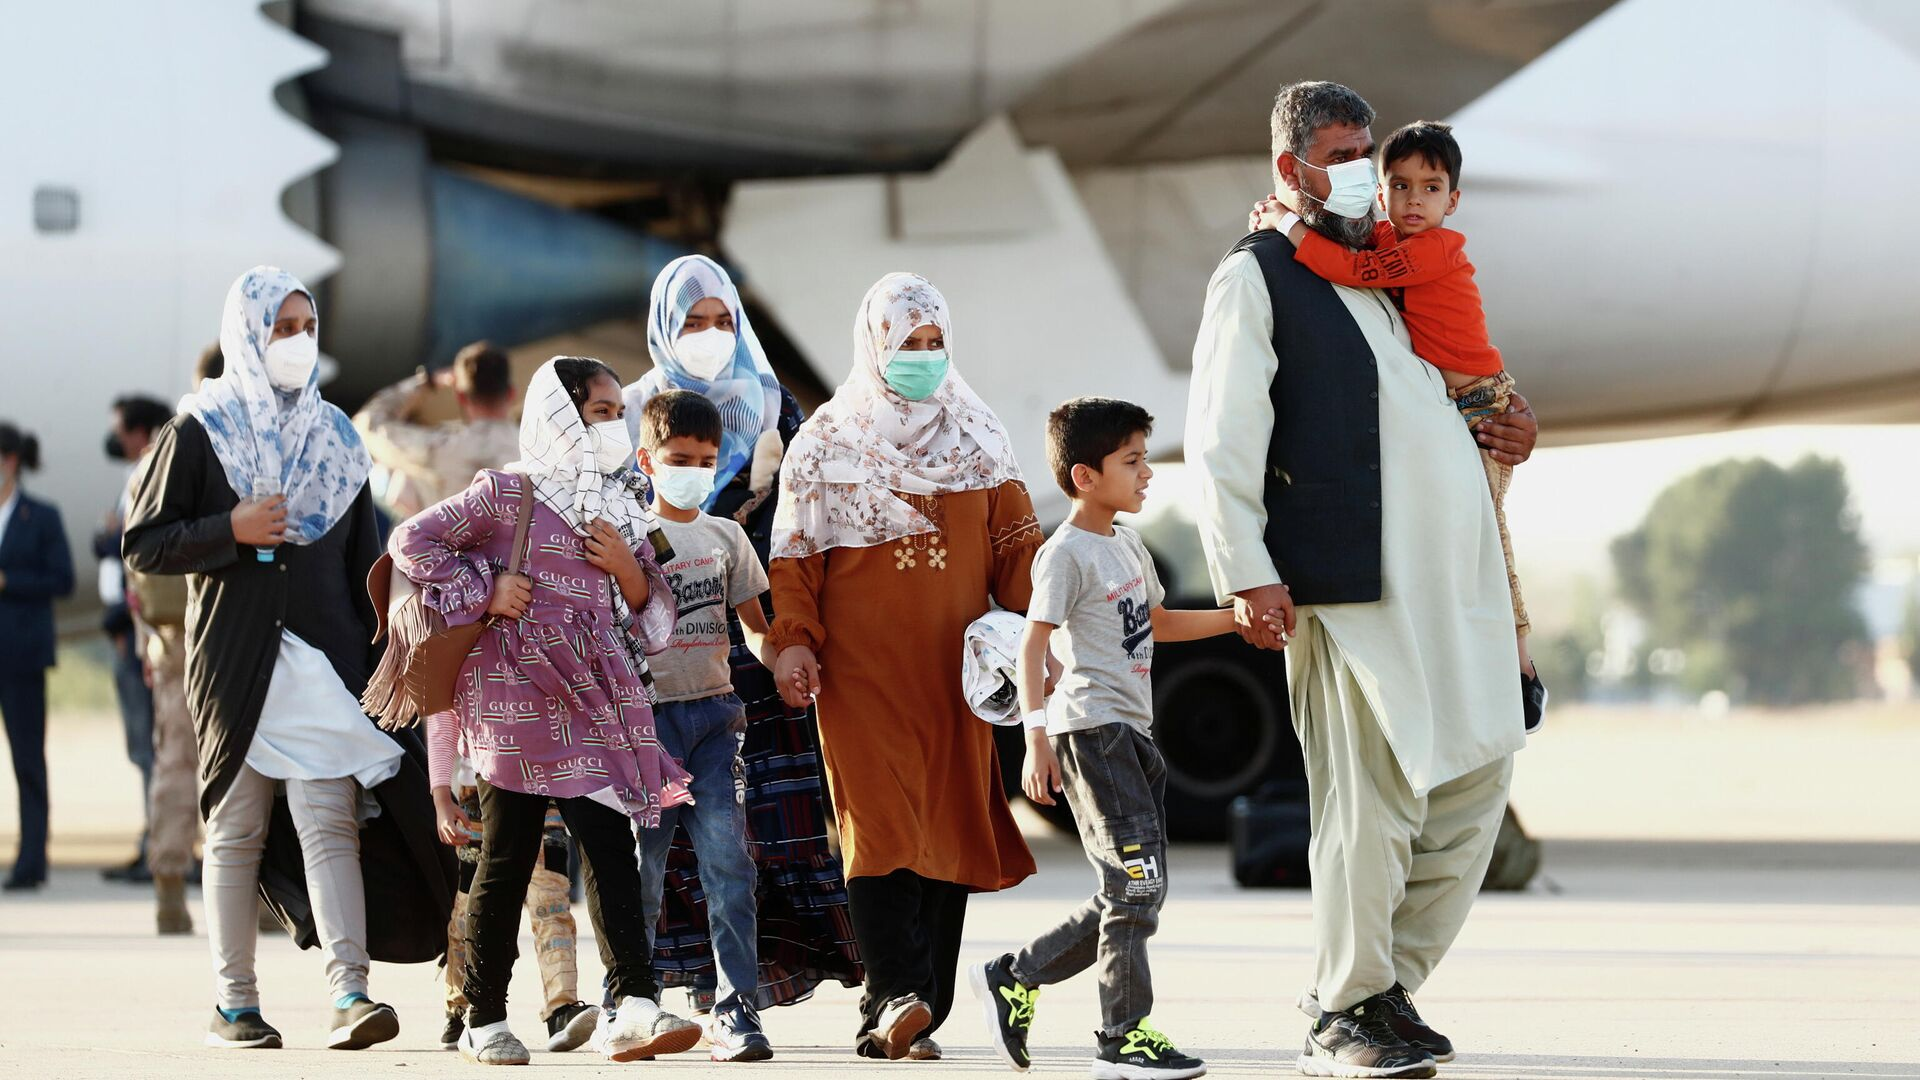 Ciudadanos afganos llegan a España desde Kabul - Sputnik Mundo, 1920, 27.08.2021